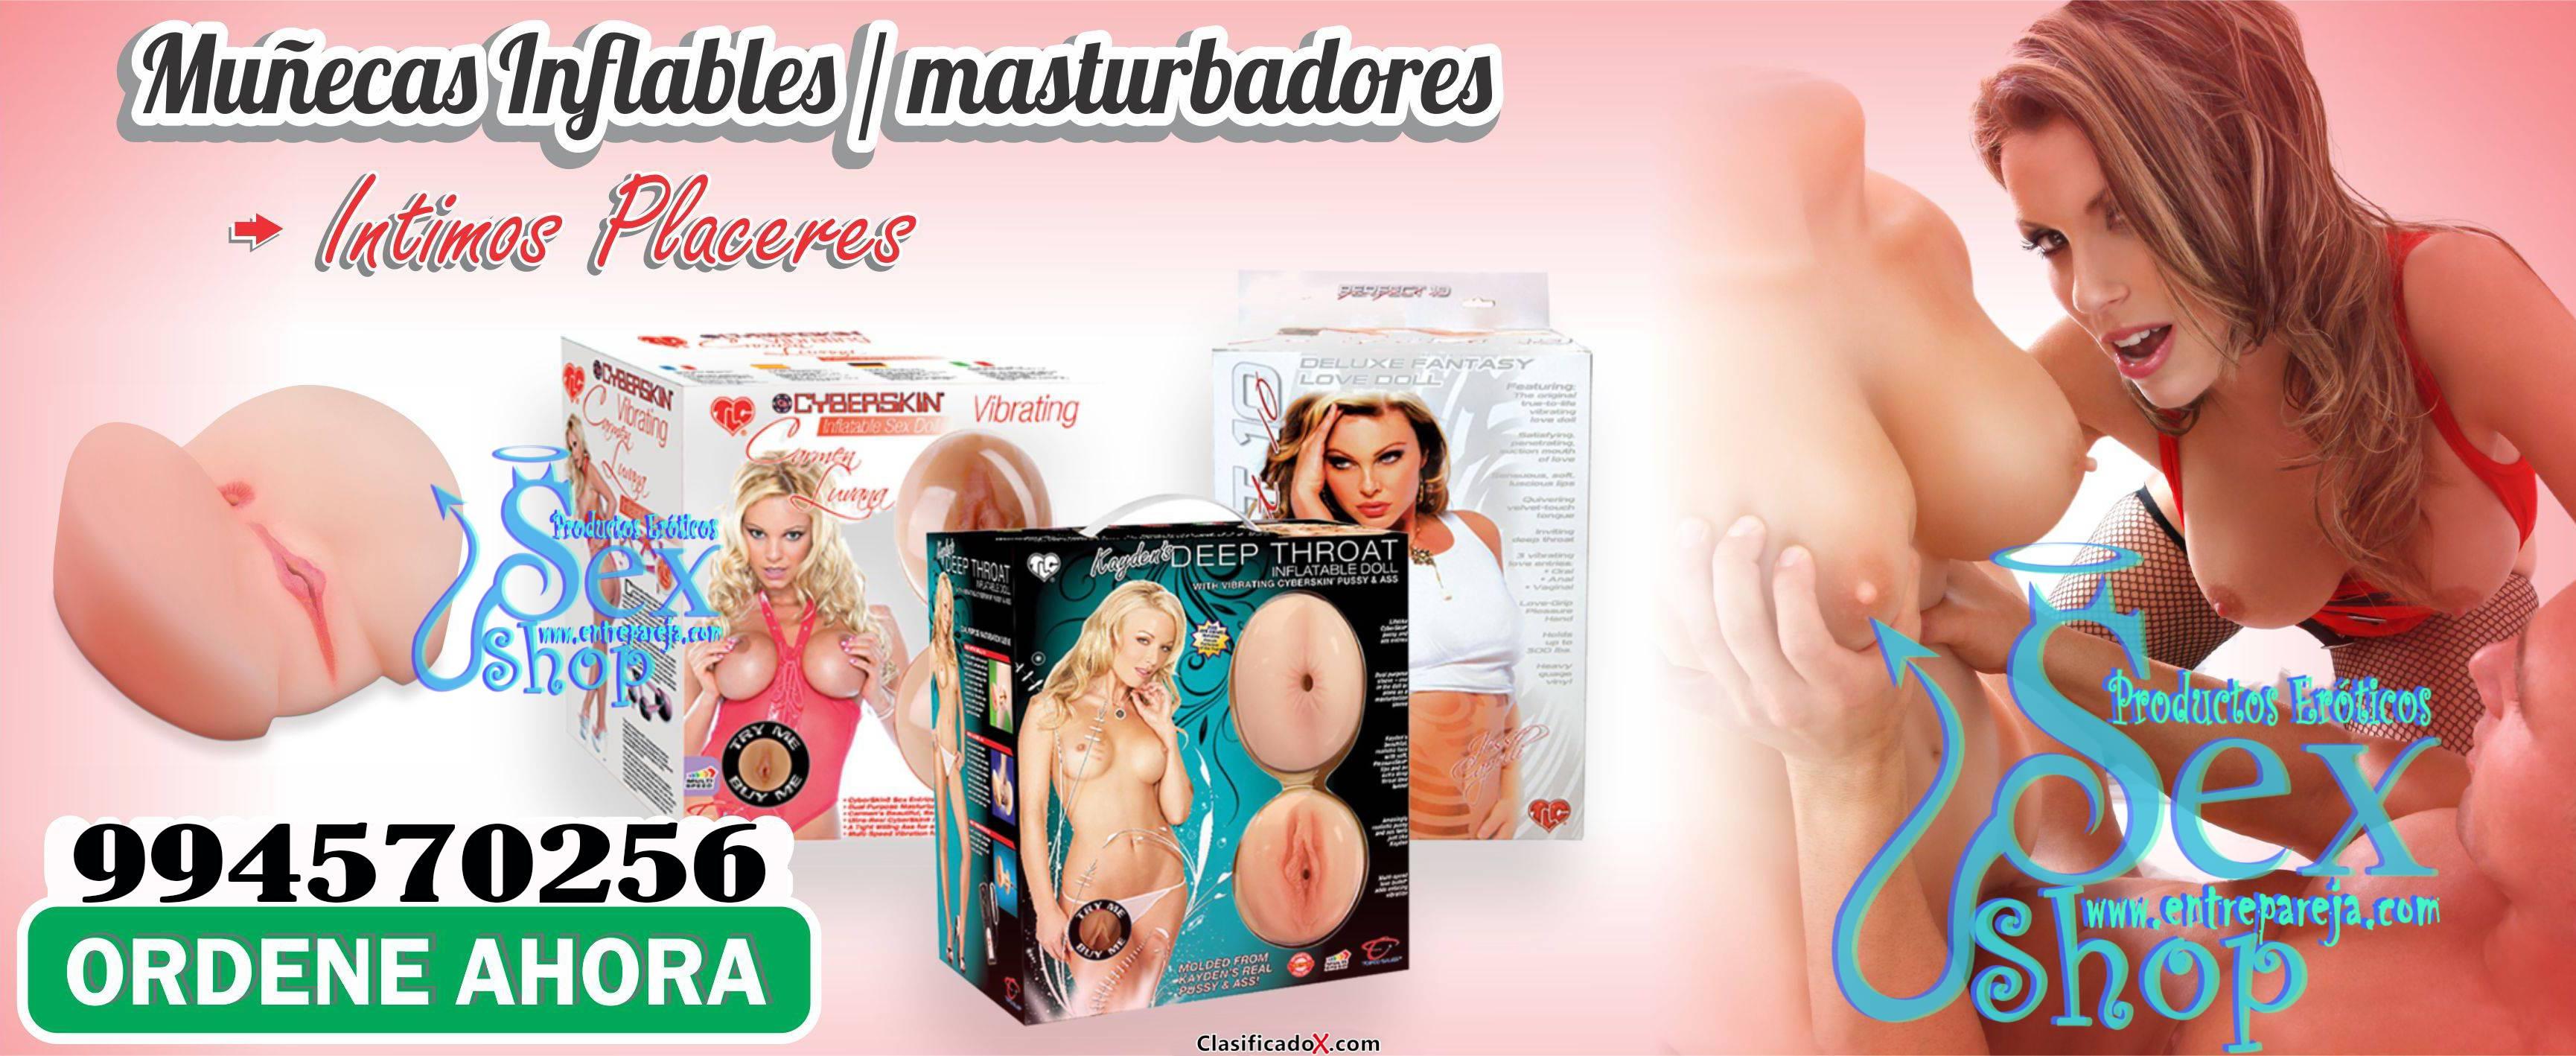 TICKLE VIBE – THE G-GIRL SEXTOYS LIMA PERU WHATSAPP: 994570256